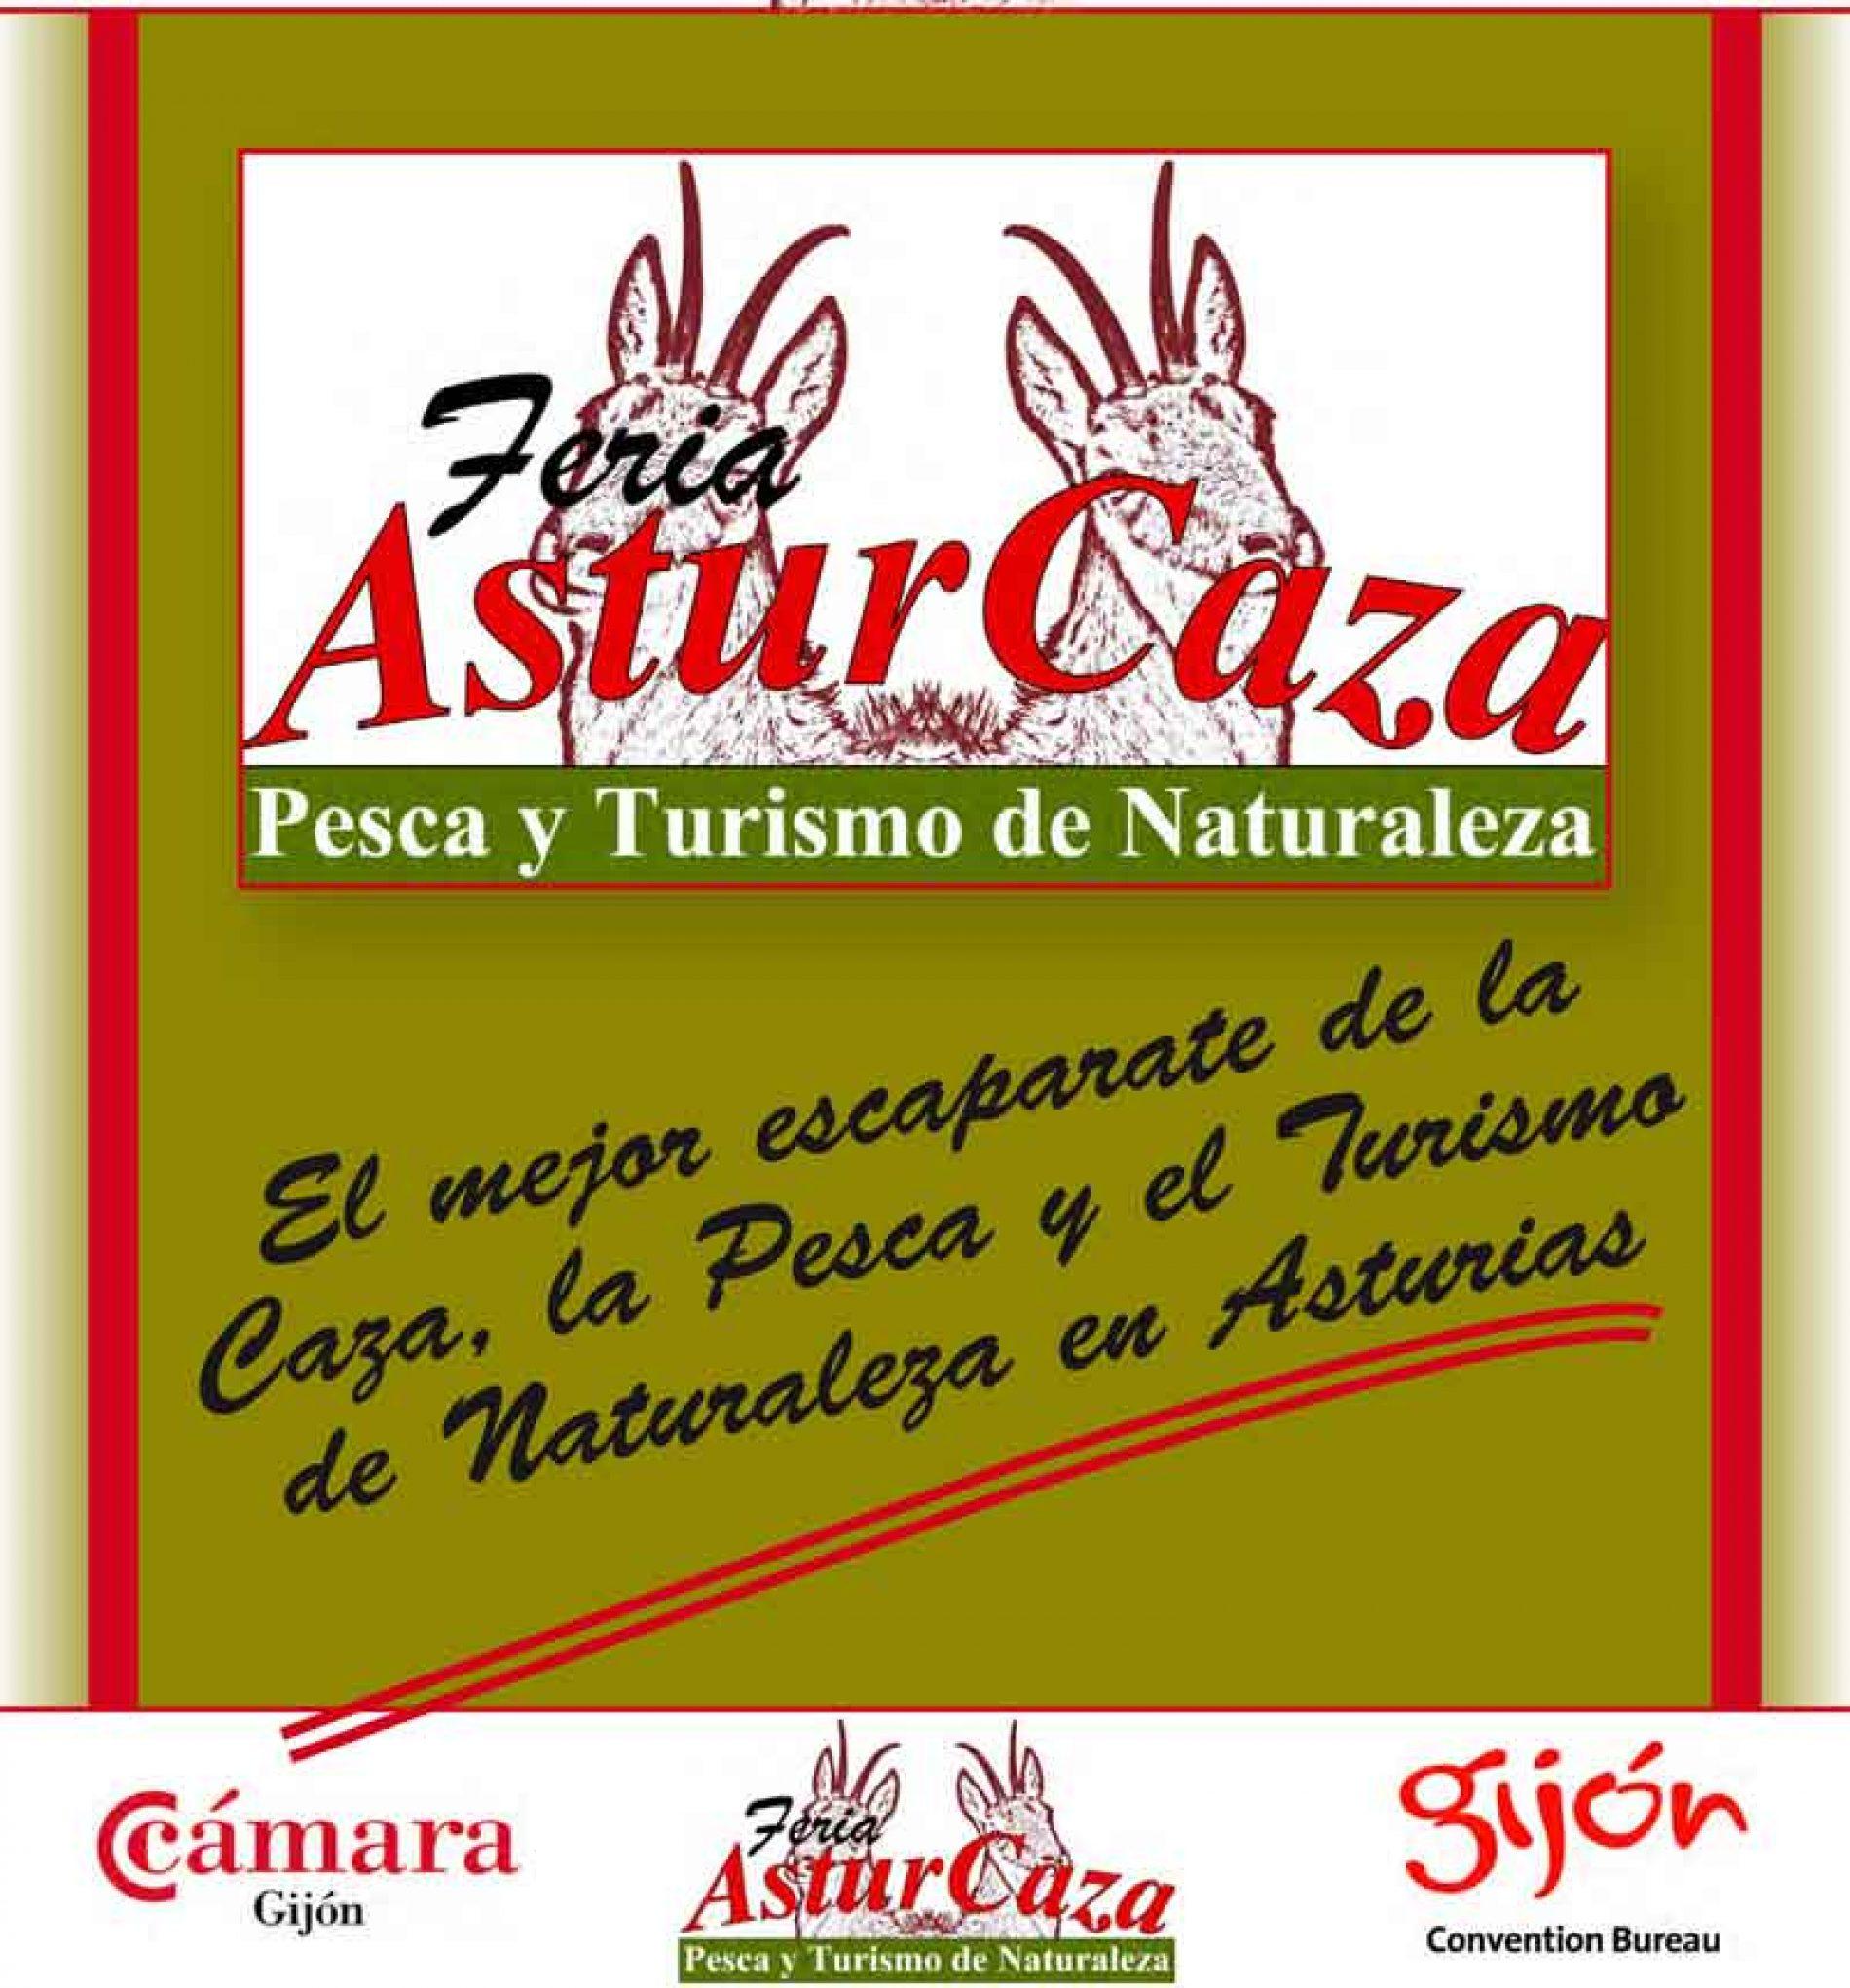 Jornadas Técnicas en la feria AsturCaza 2017